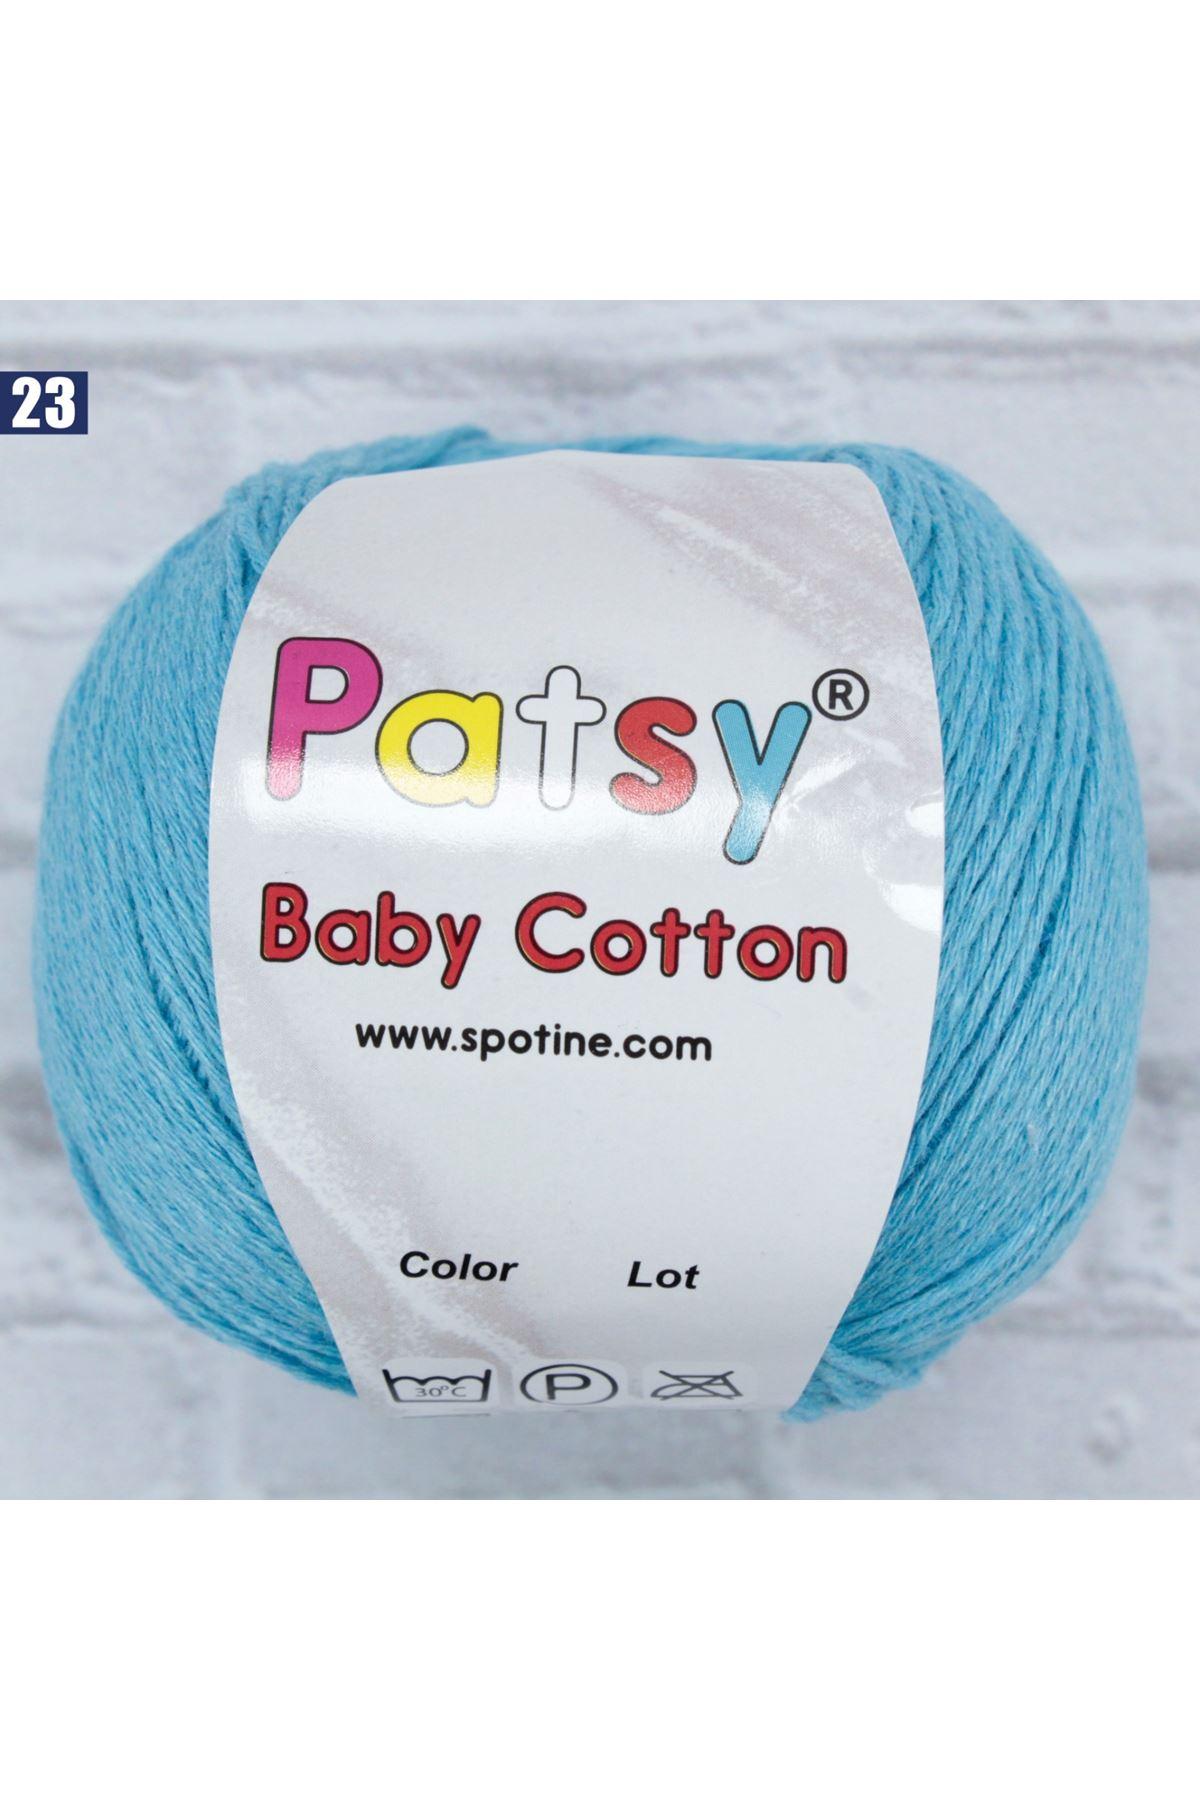 Patsy Baby Cotton 23